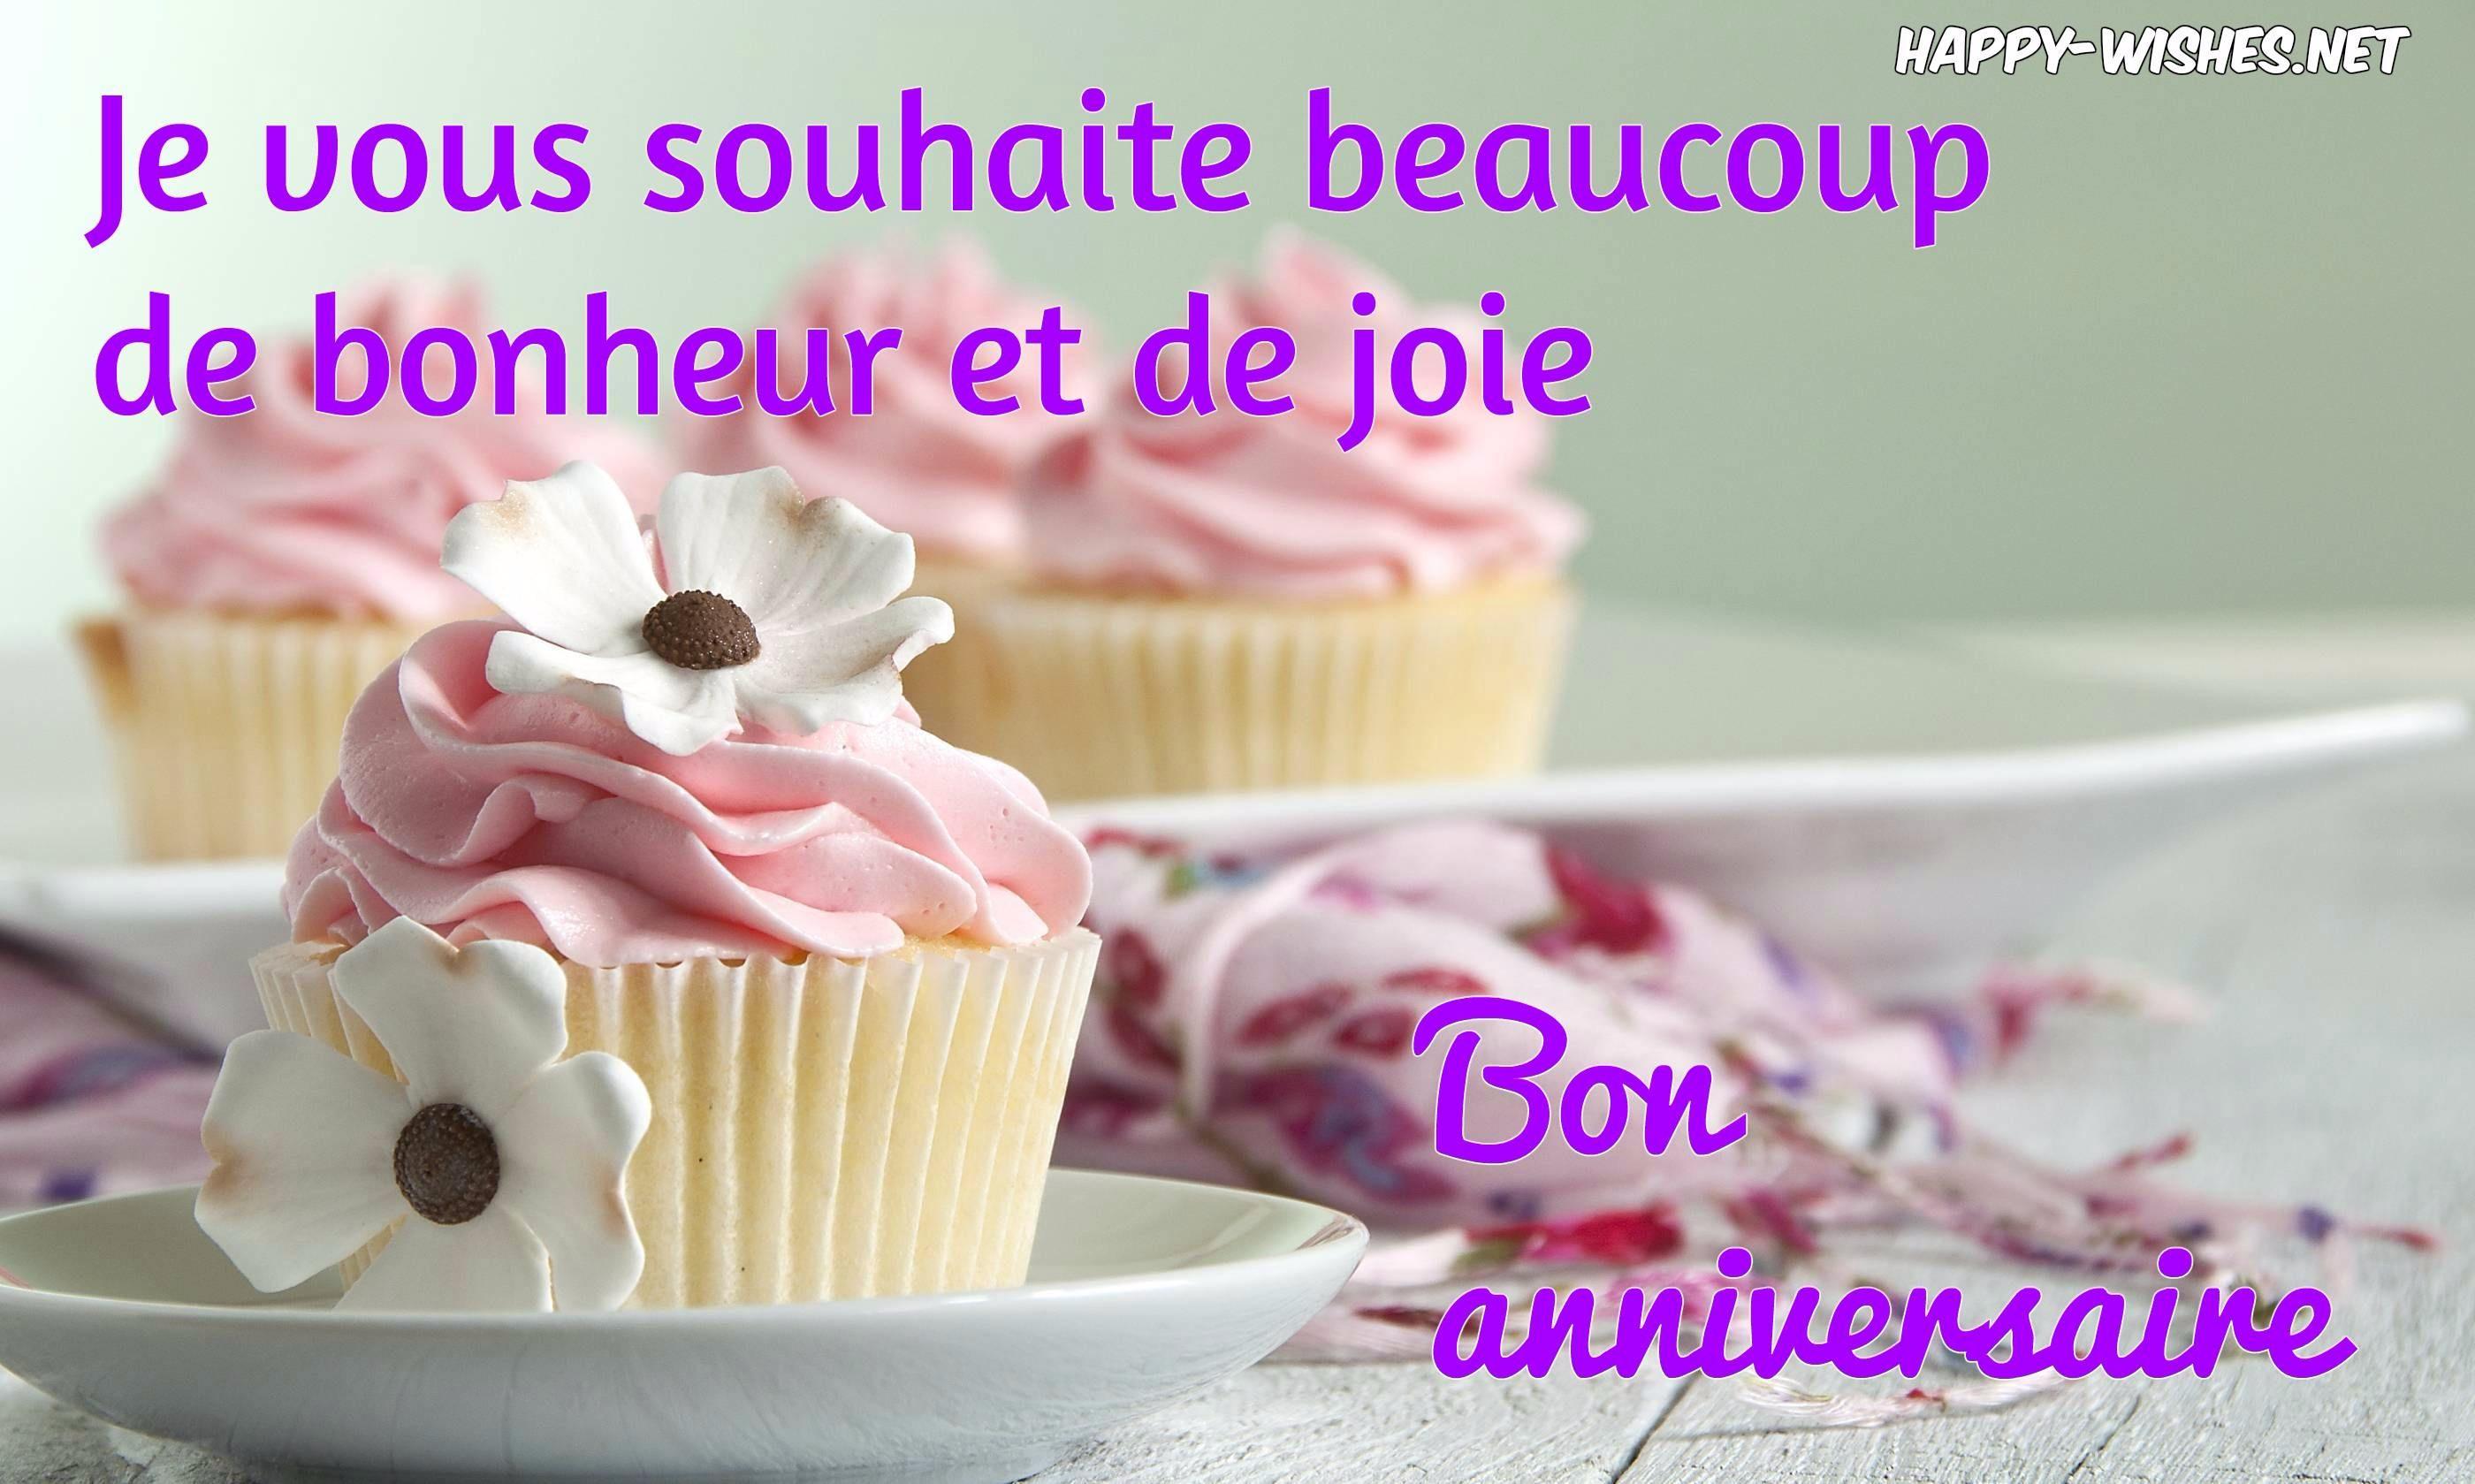 Happy Birthday (Bon anniversaire) Wishes In French Happy